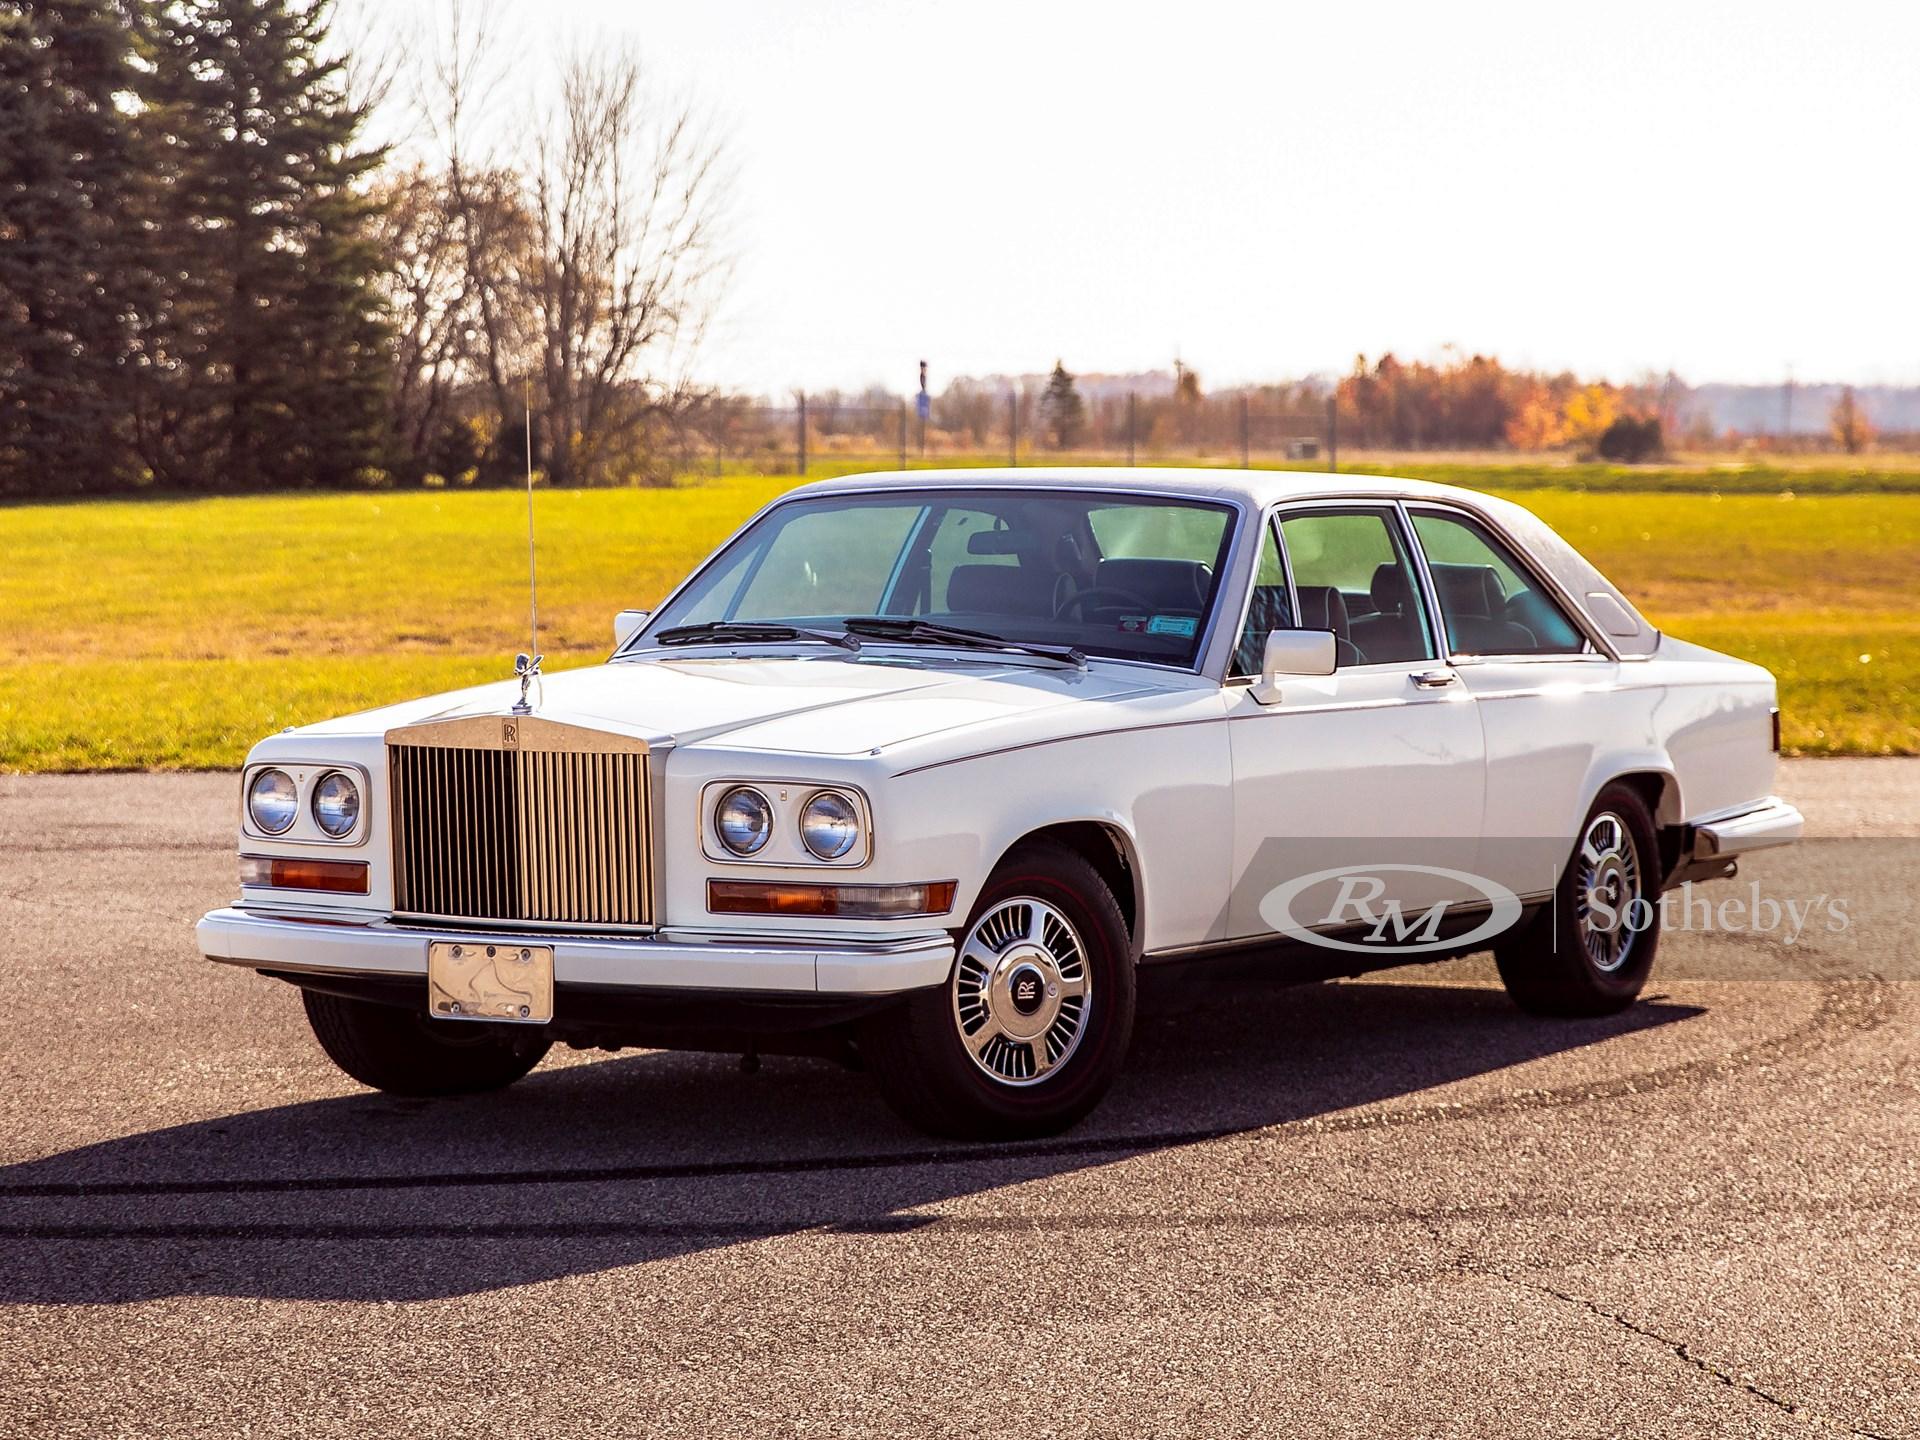 1987 Rolls-Royce Camargue